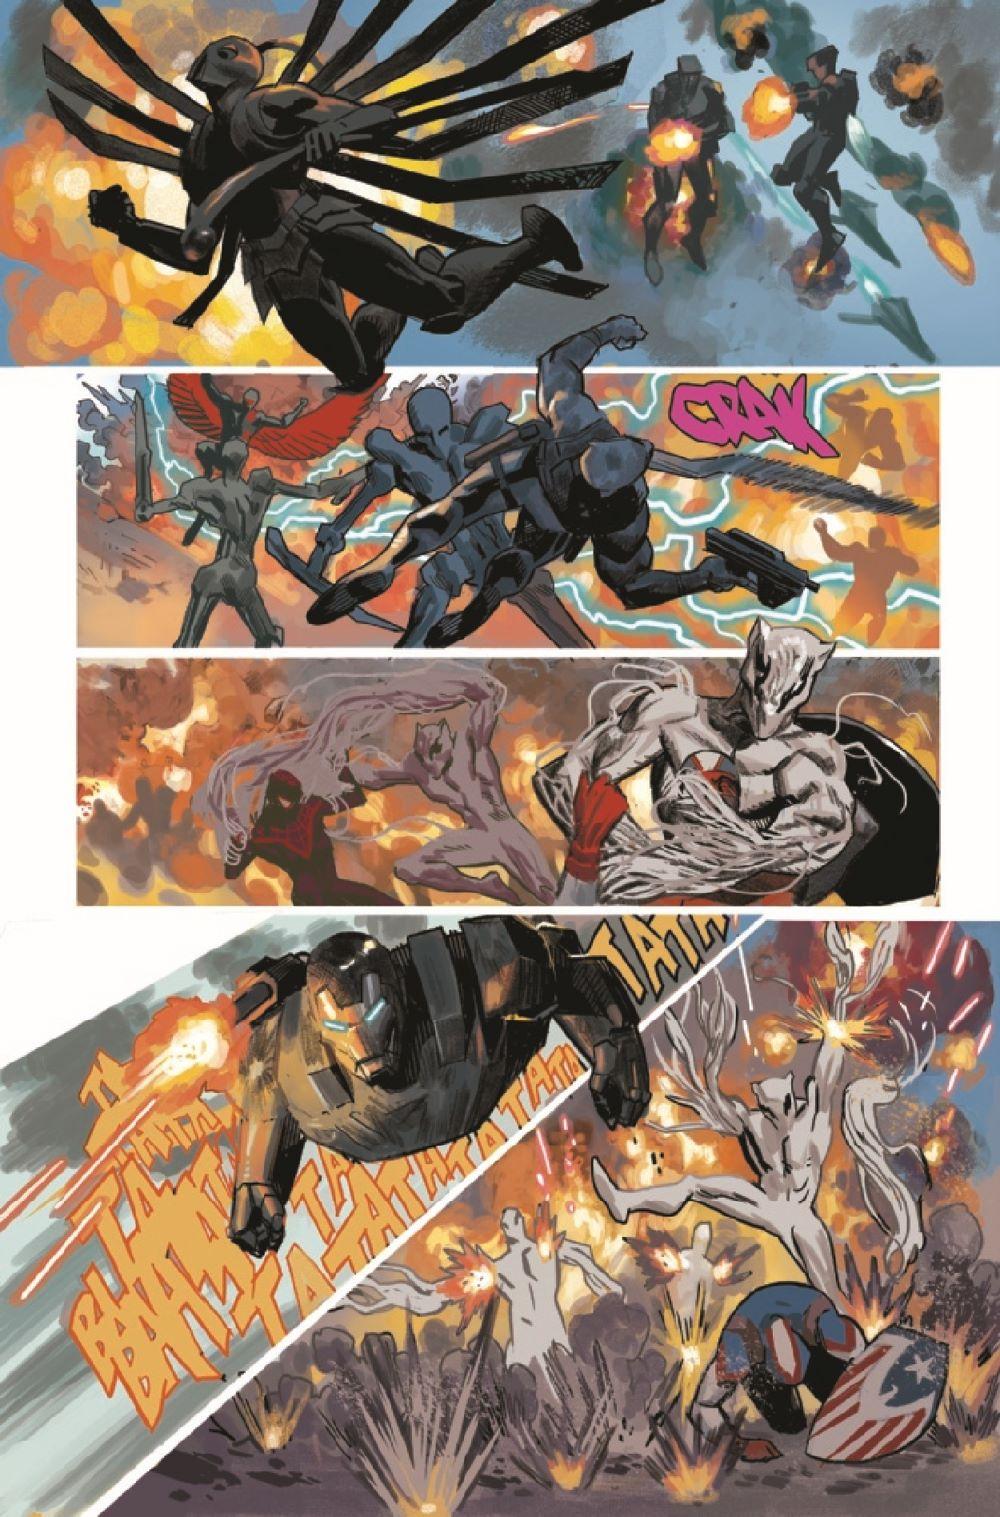 BLAP2018025_Preview-5 ComicList Previews: BLACK PANTHER #25